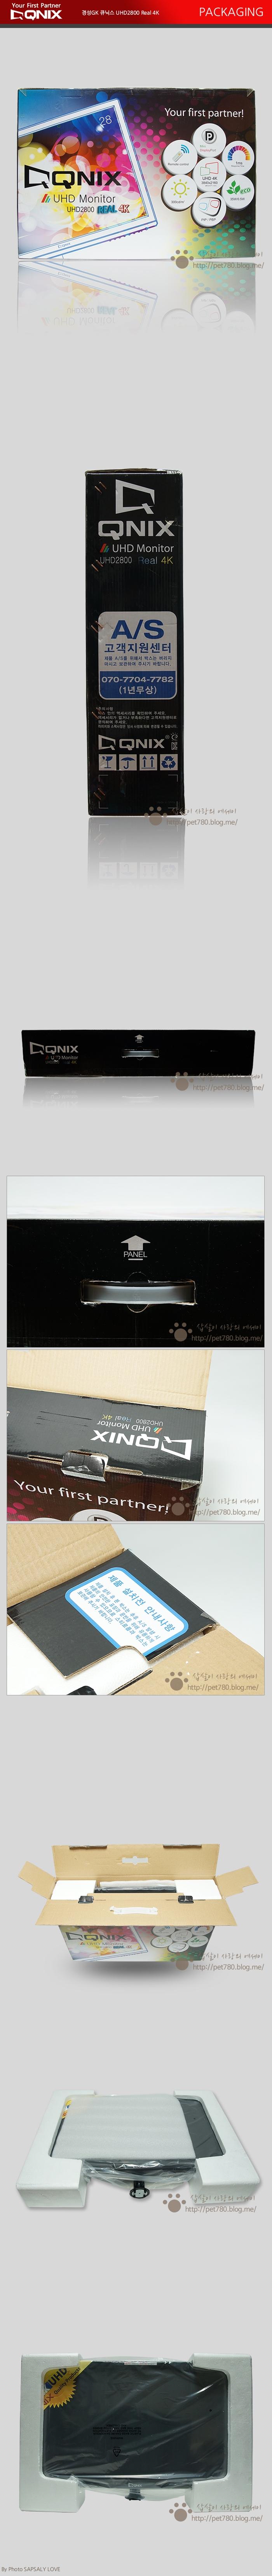 UHD 모니터 패키지 경성GK 큐닉스 UHD2800 Real 4K.jpg